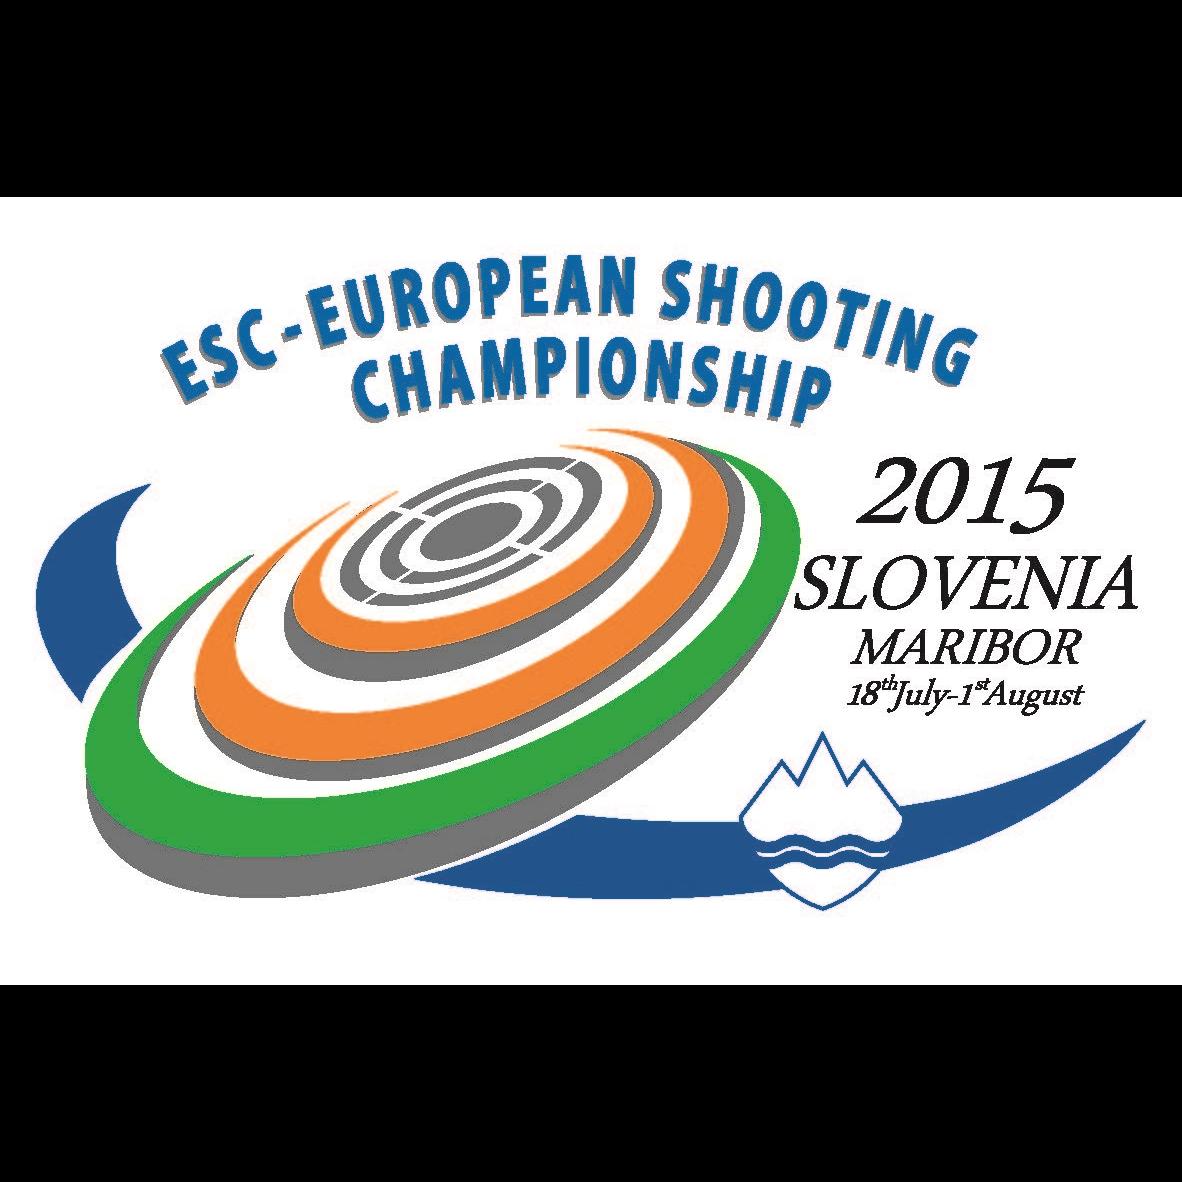 2015 European Shooting Championships